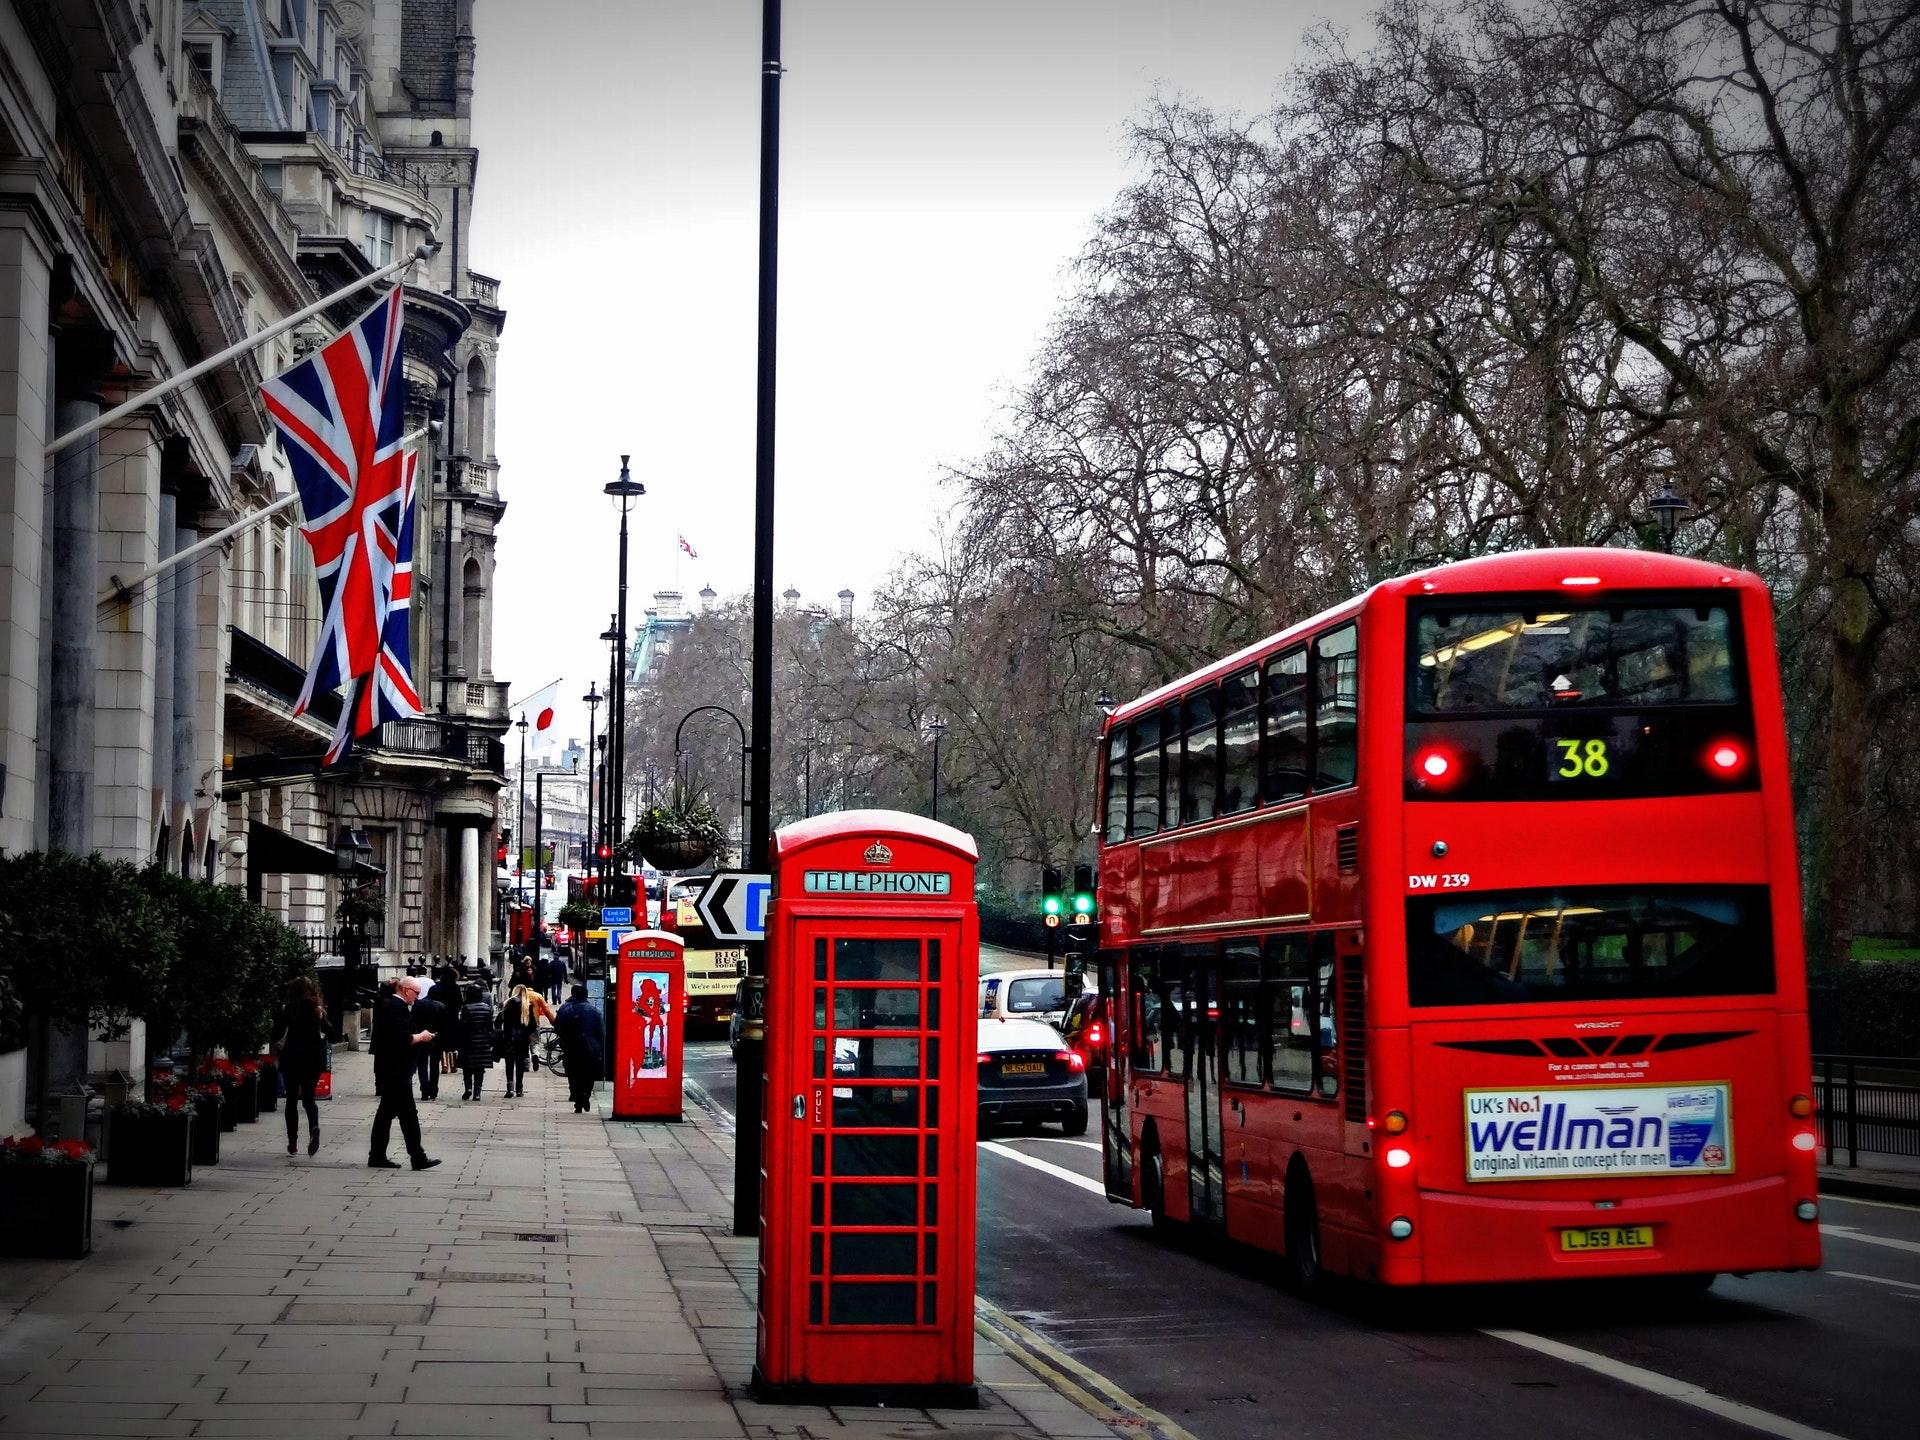 london-street-phone-cabin-163037.jpeg